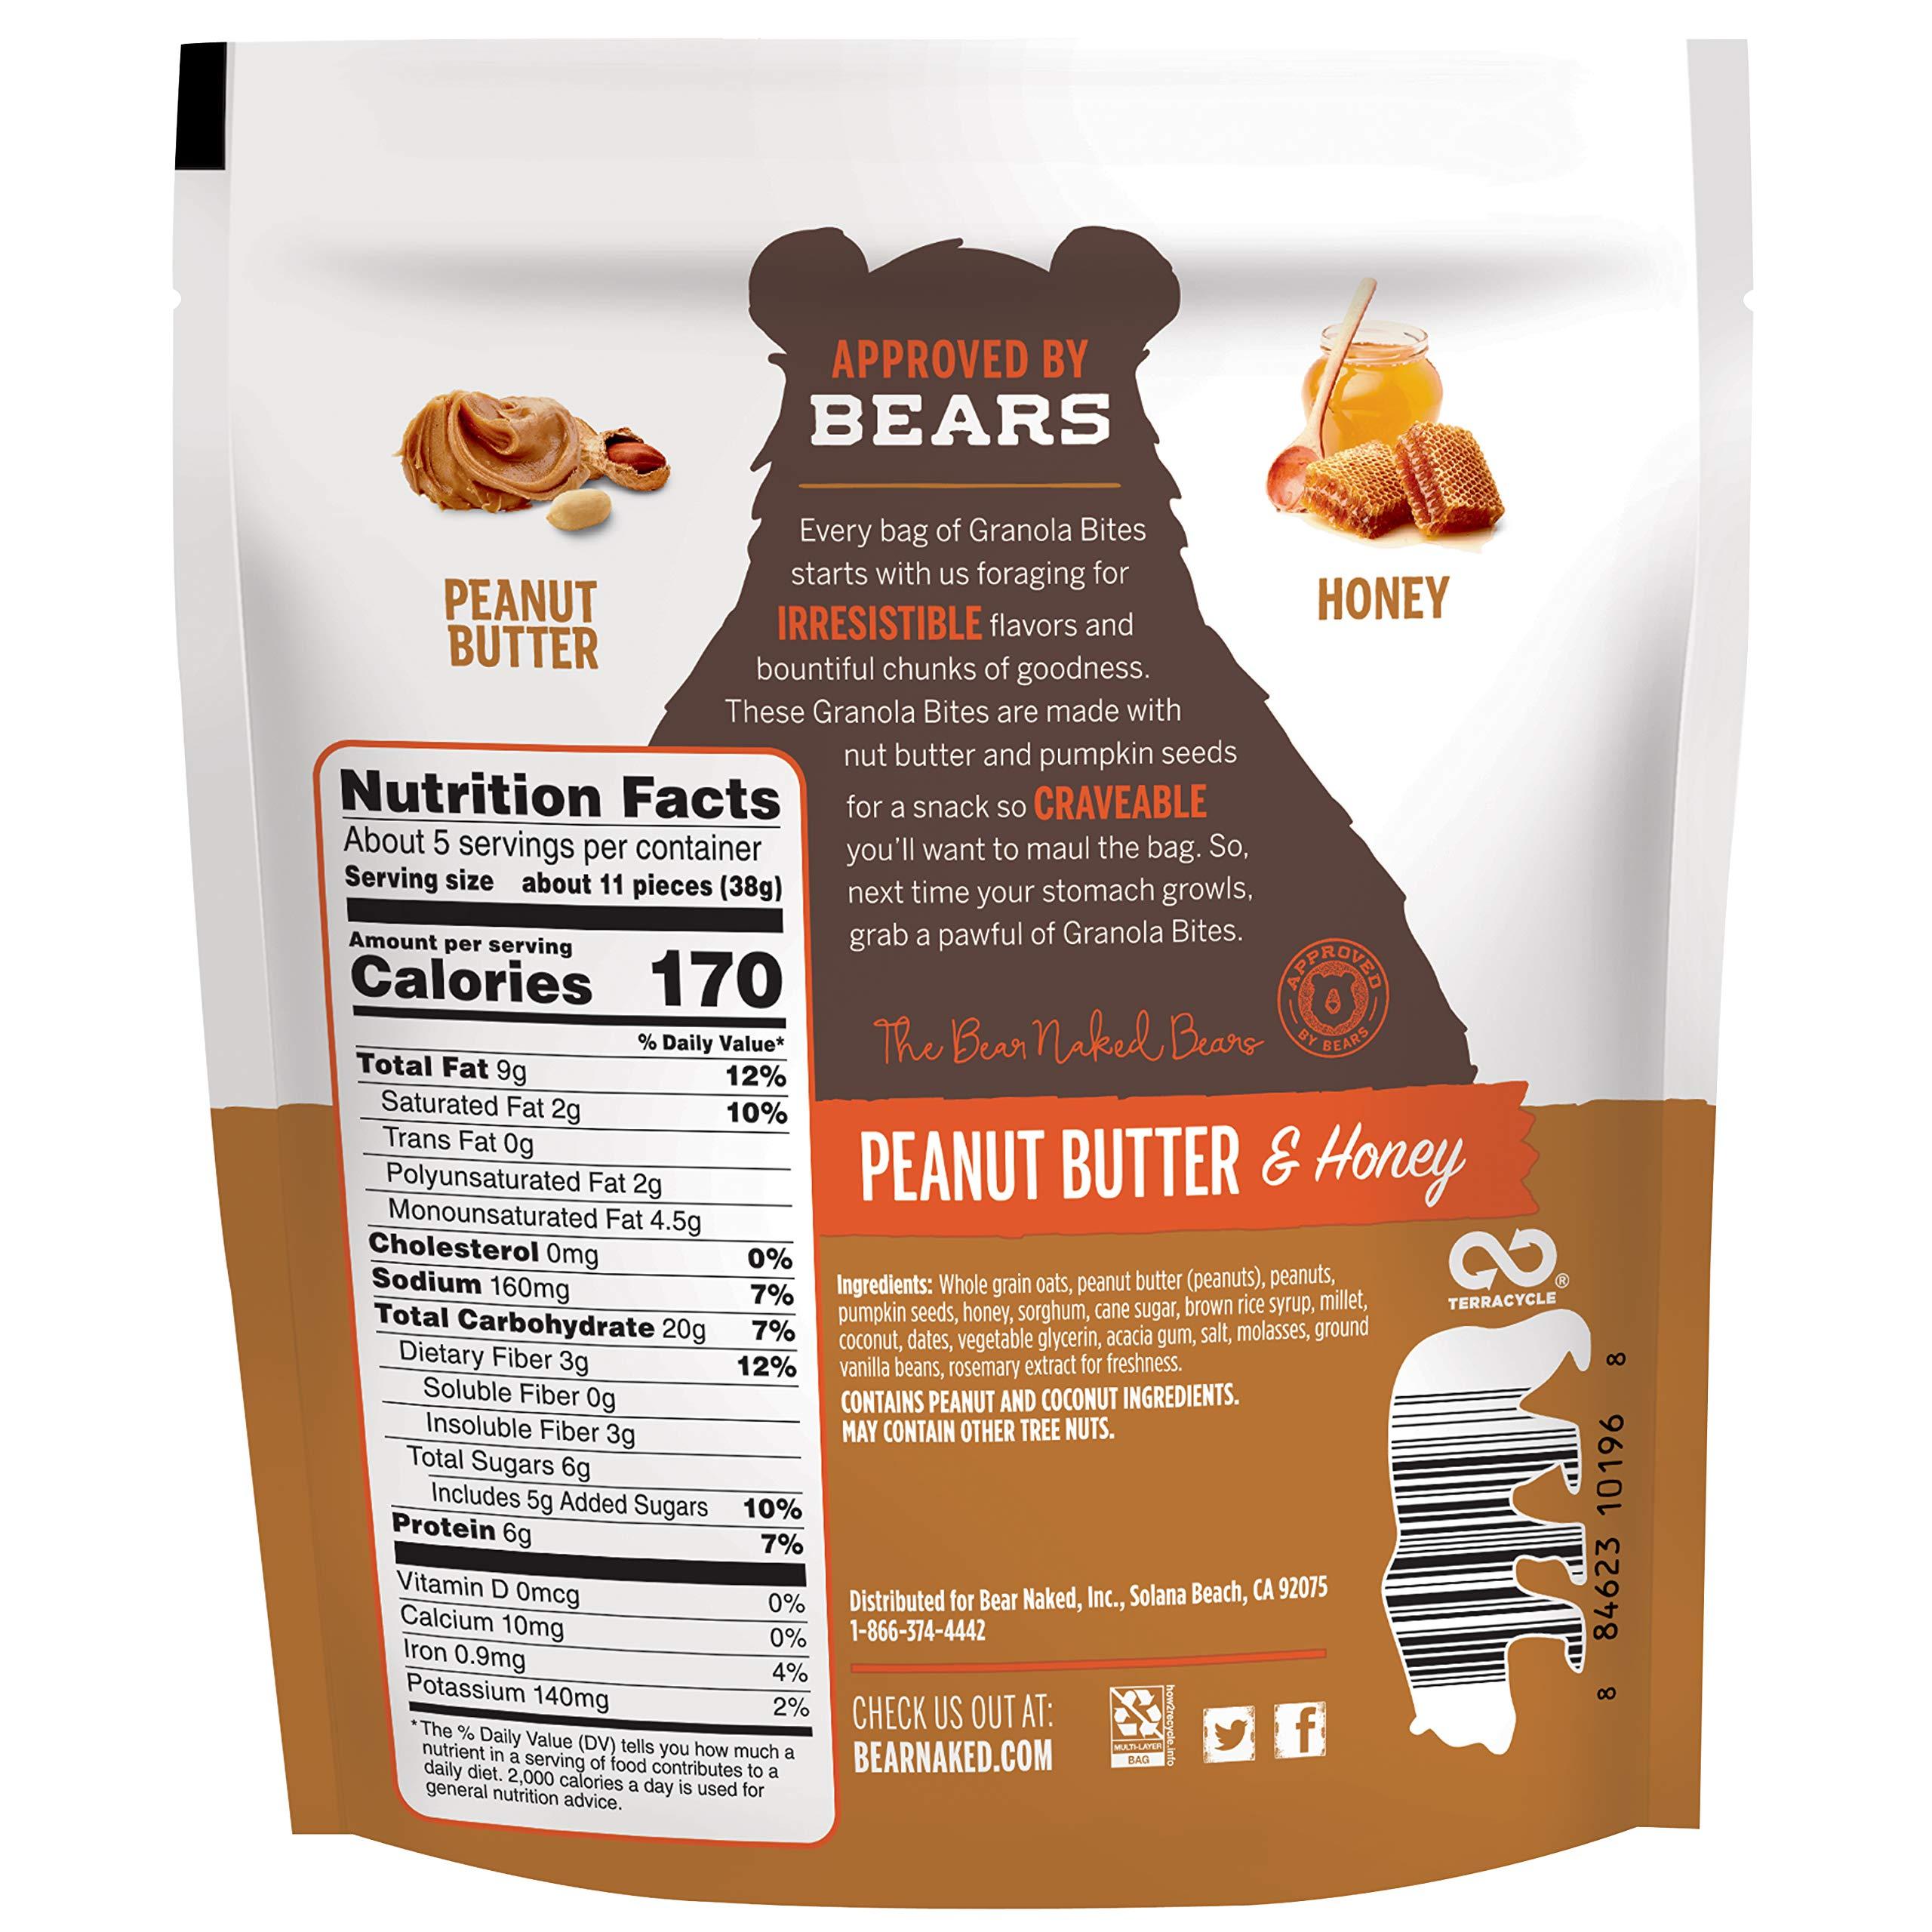 Bear Naked Peanut Butter & Honey Granola Bites - Gluten Free | Non-GMO | Kosher | Vegetarian Friendly - 7.2 Oz by Bear Naked (Image #2)